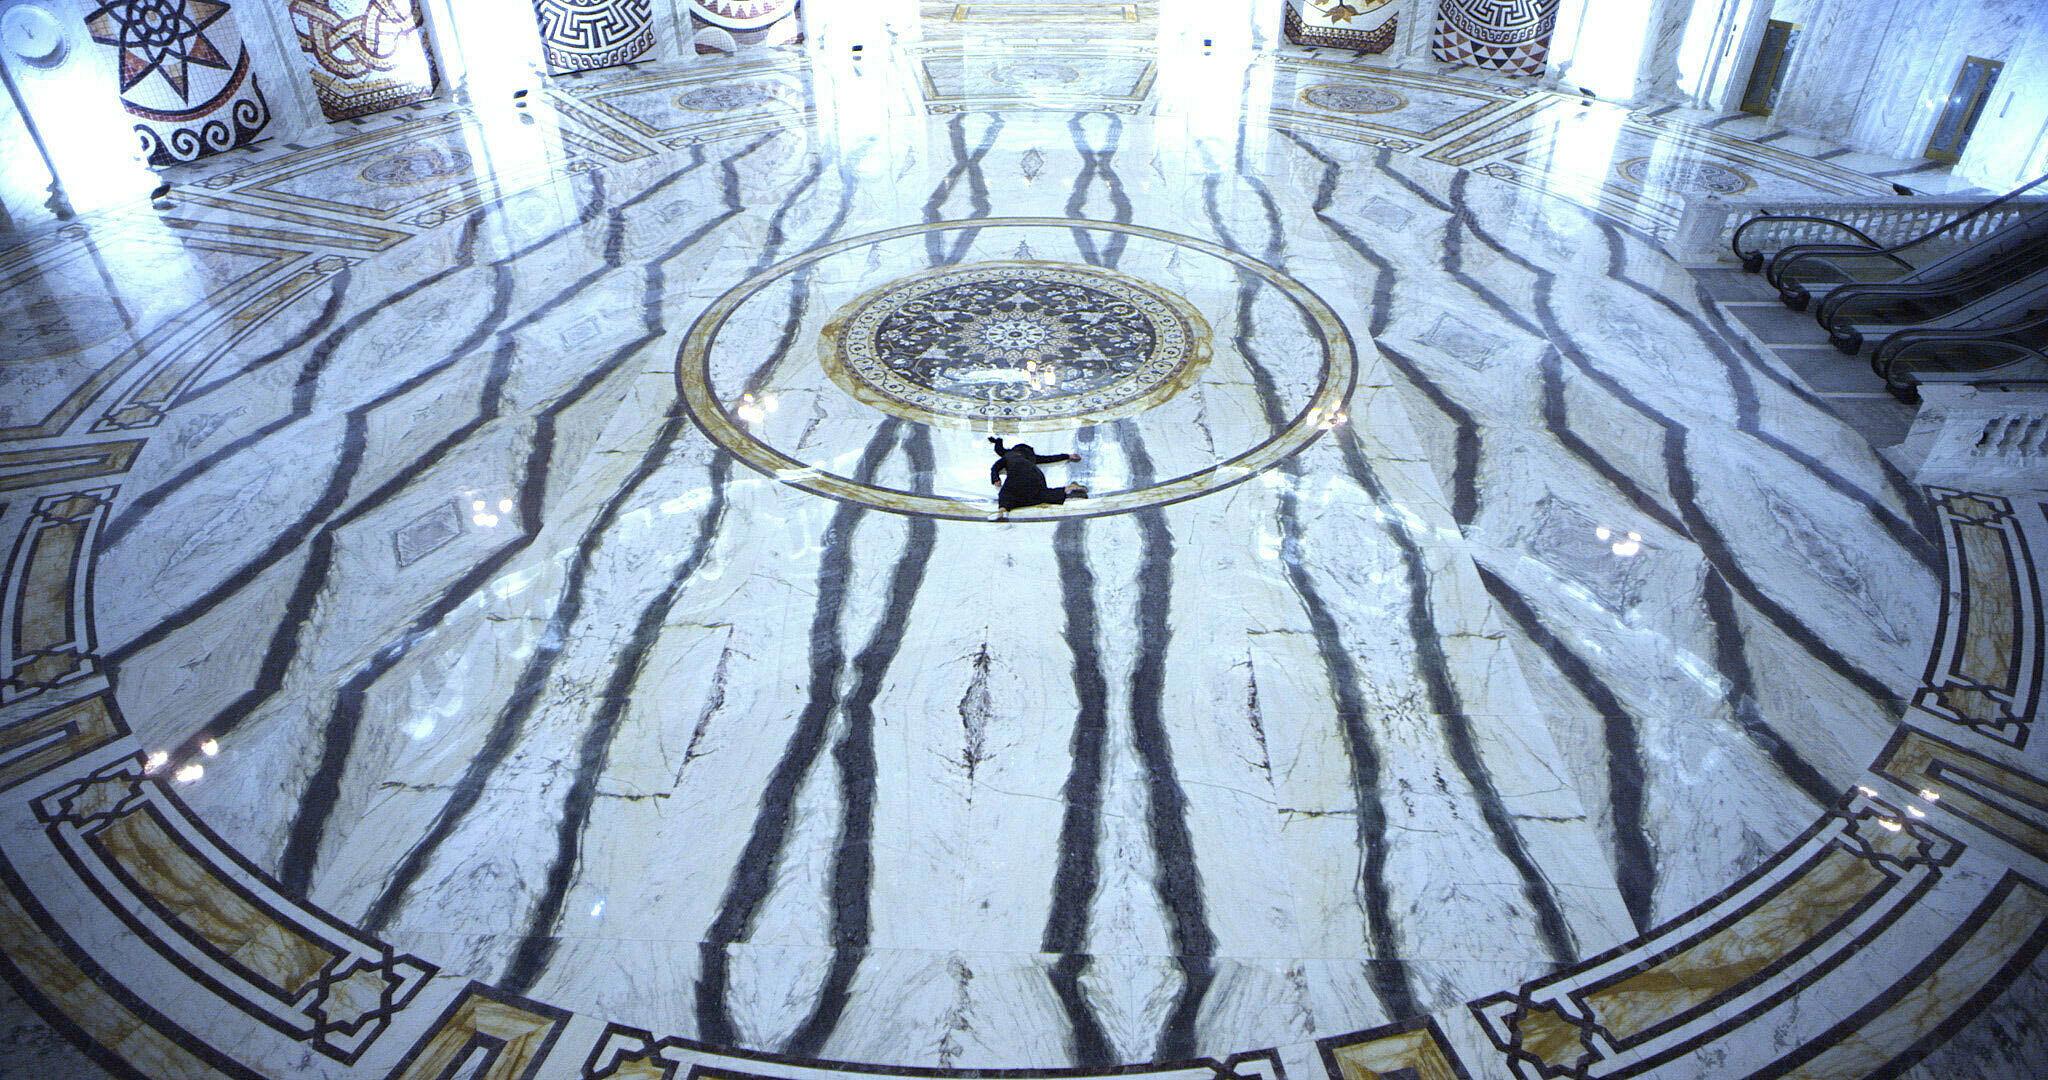 A woman in black sprawled on a marble floor